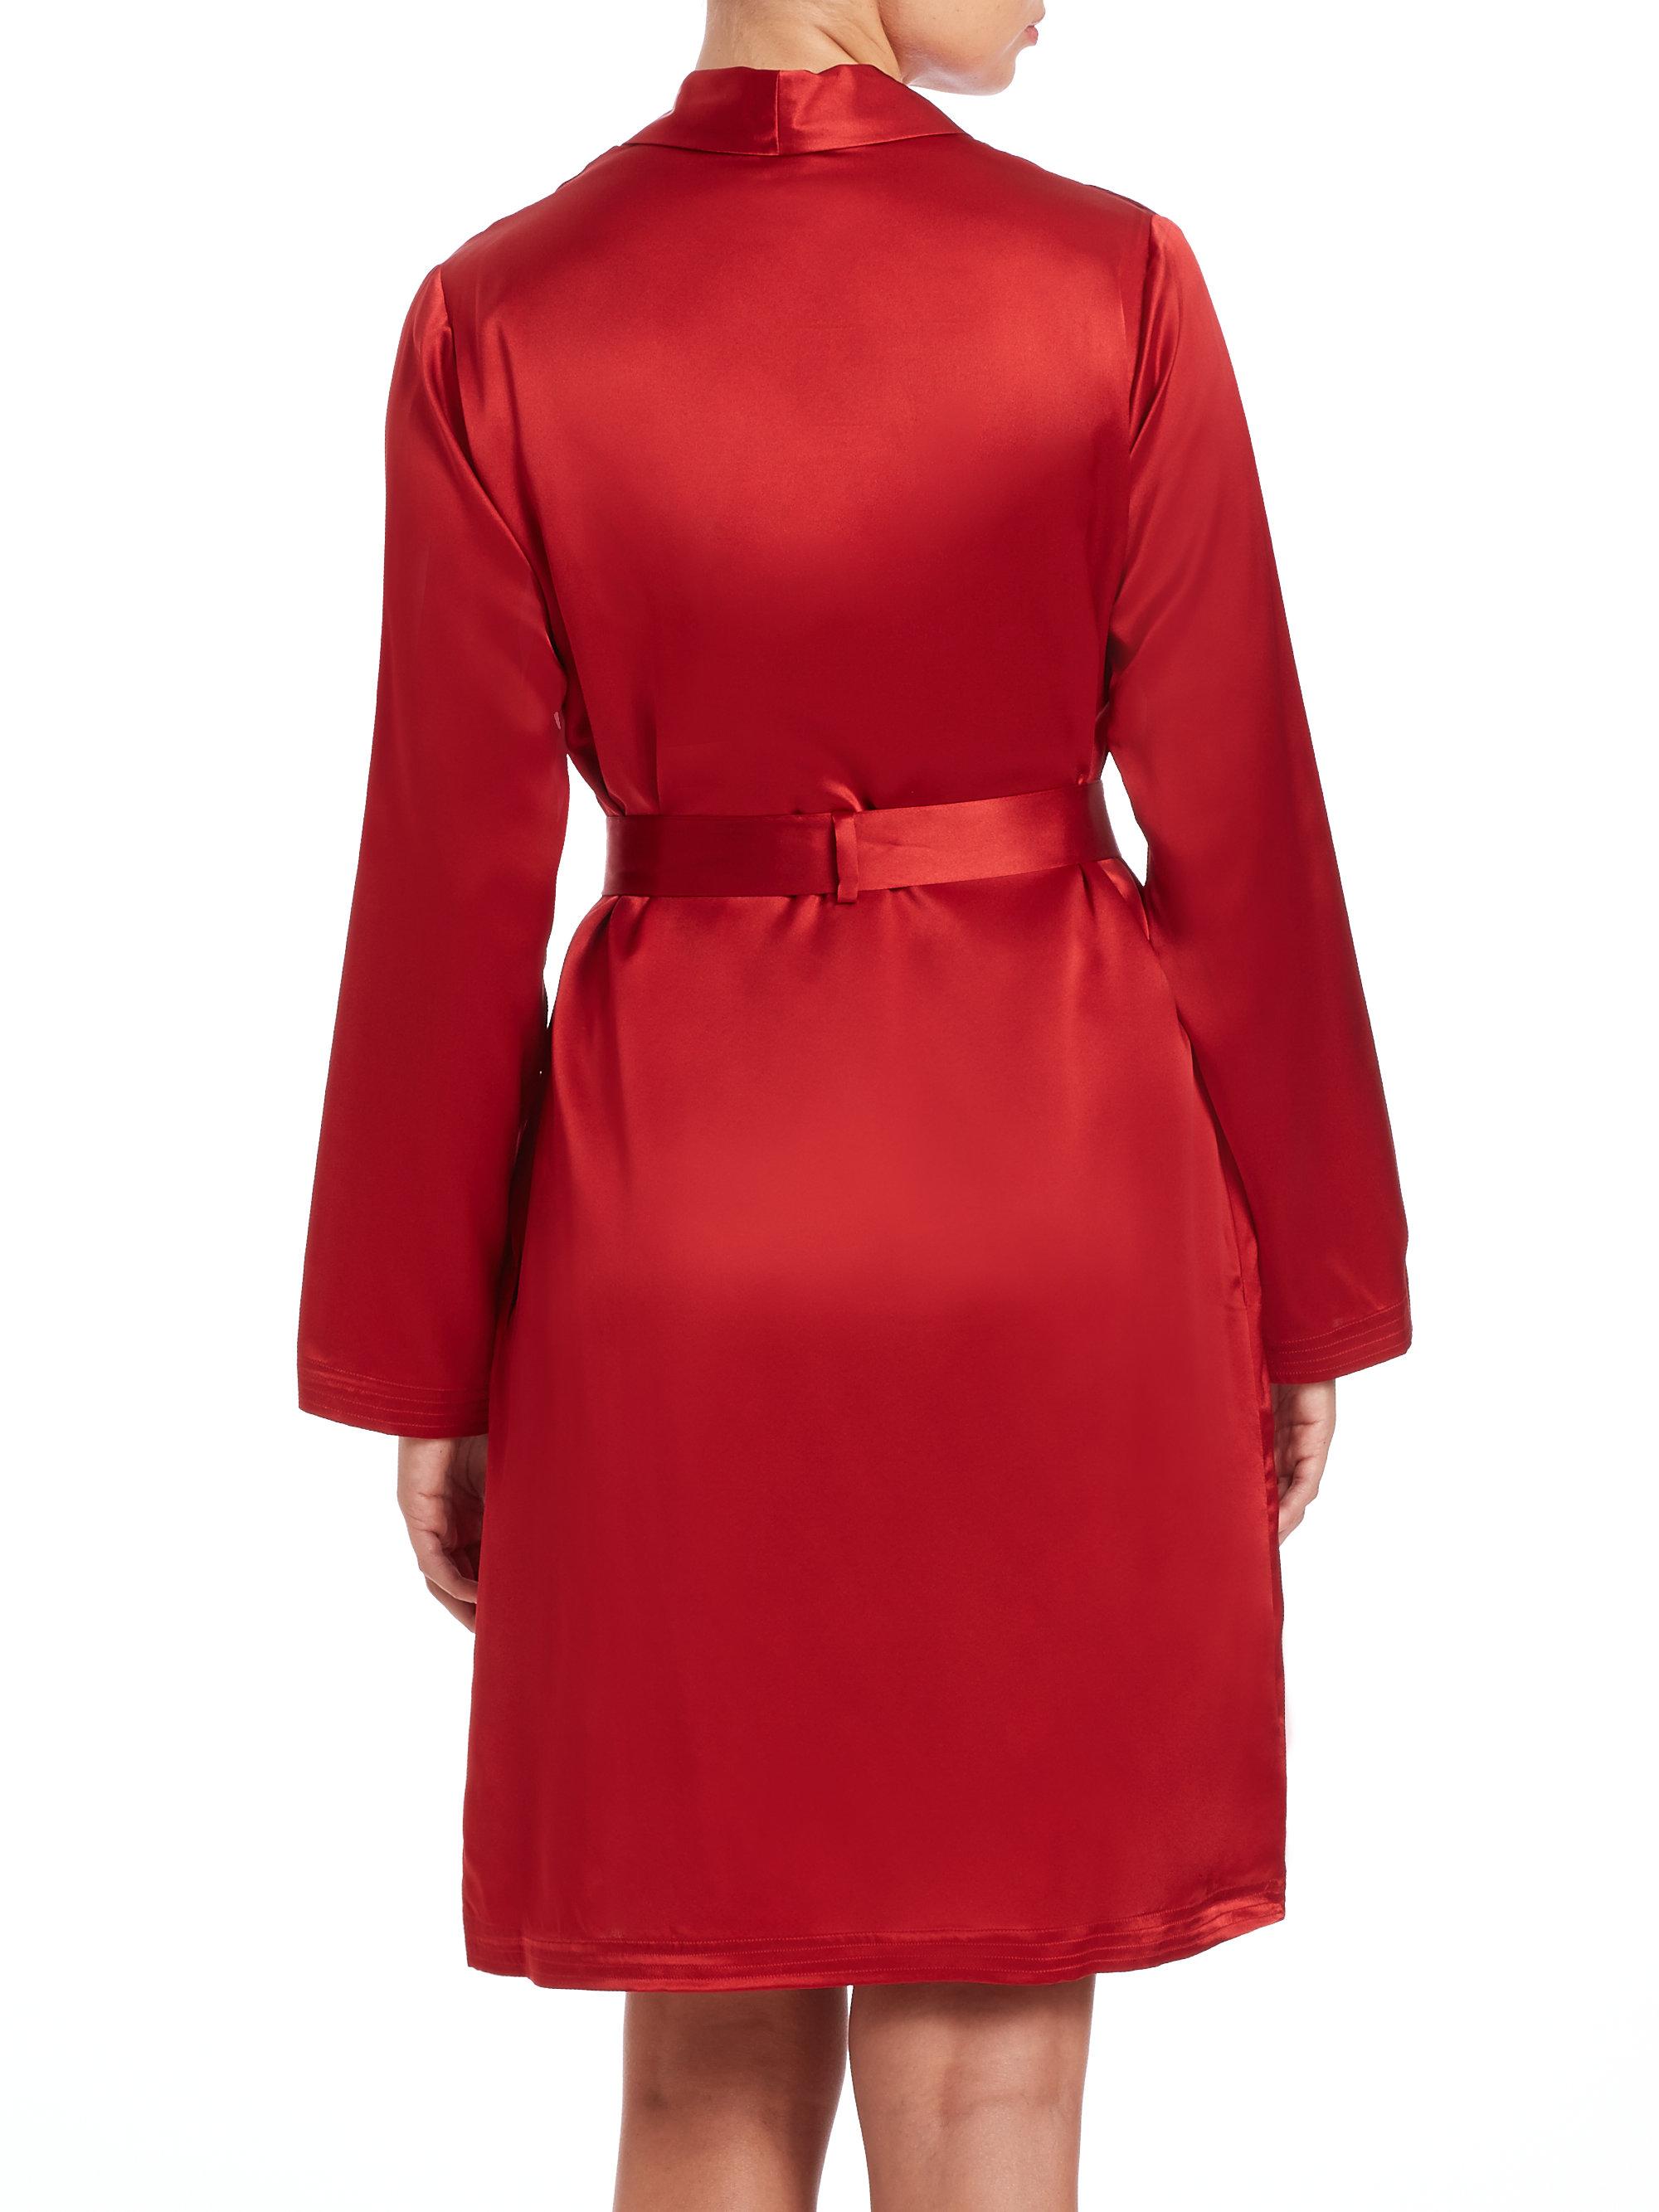 Lyst - Donna Karan Long Silk Glamour Robe in Red |Red Silk Robe